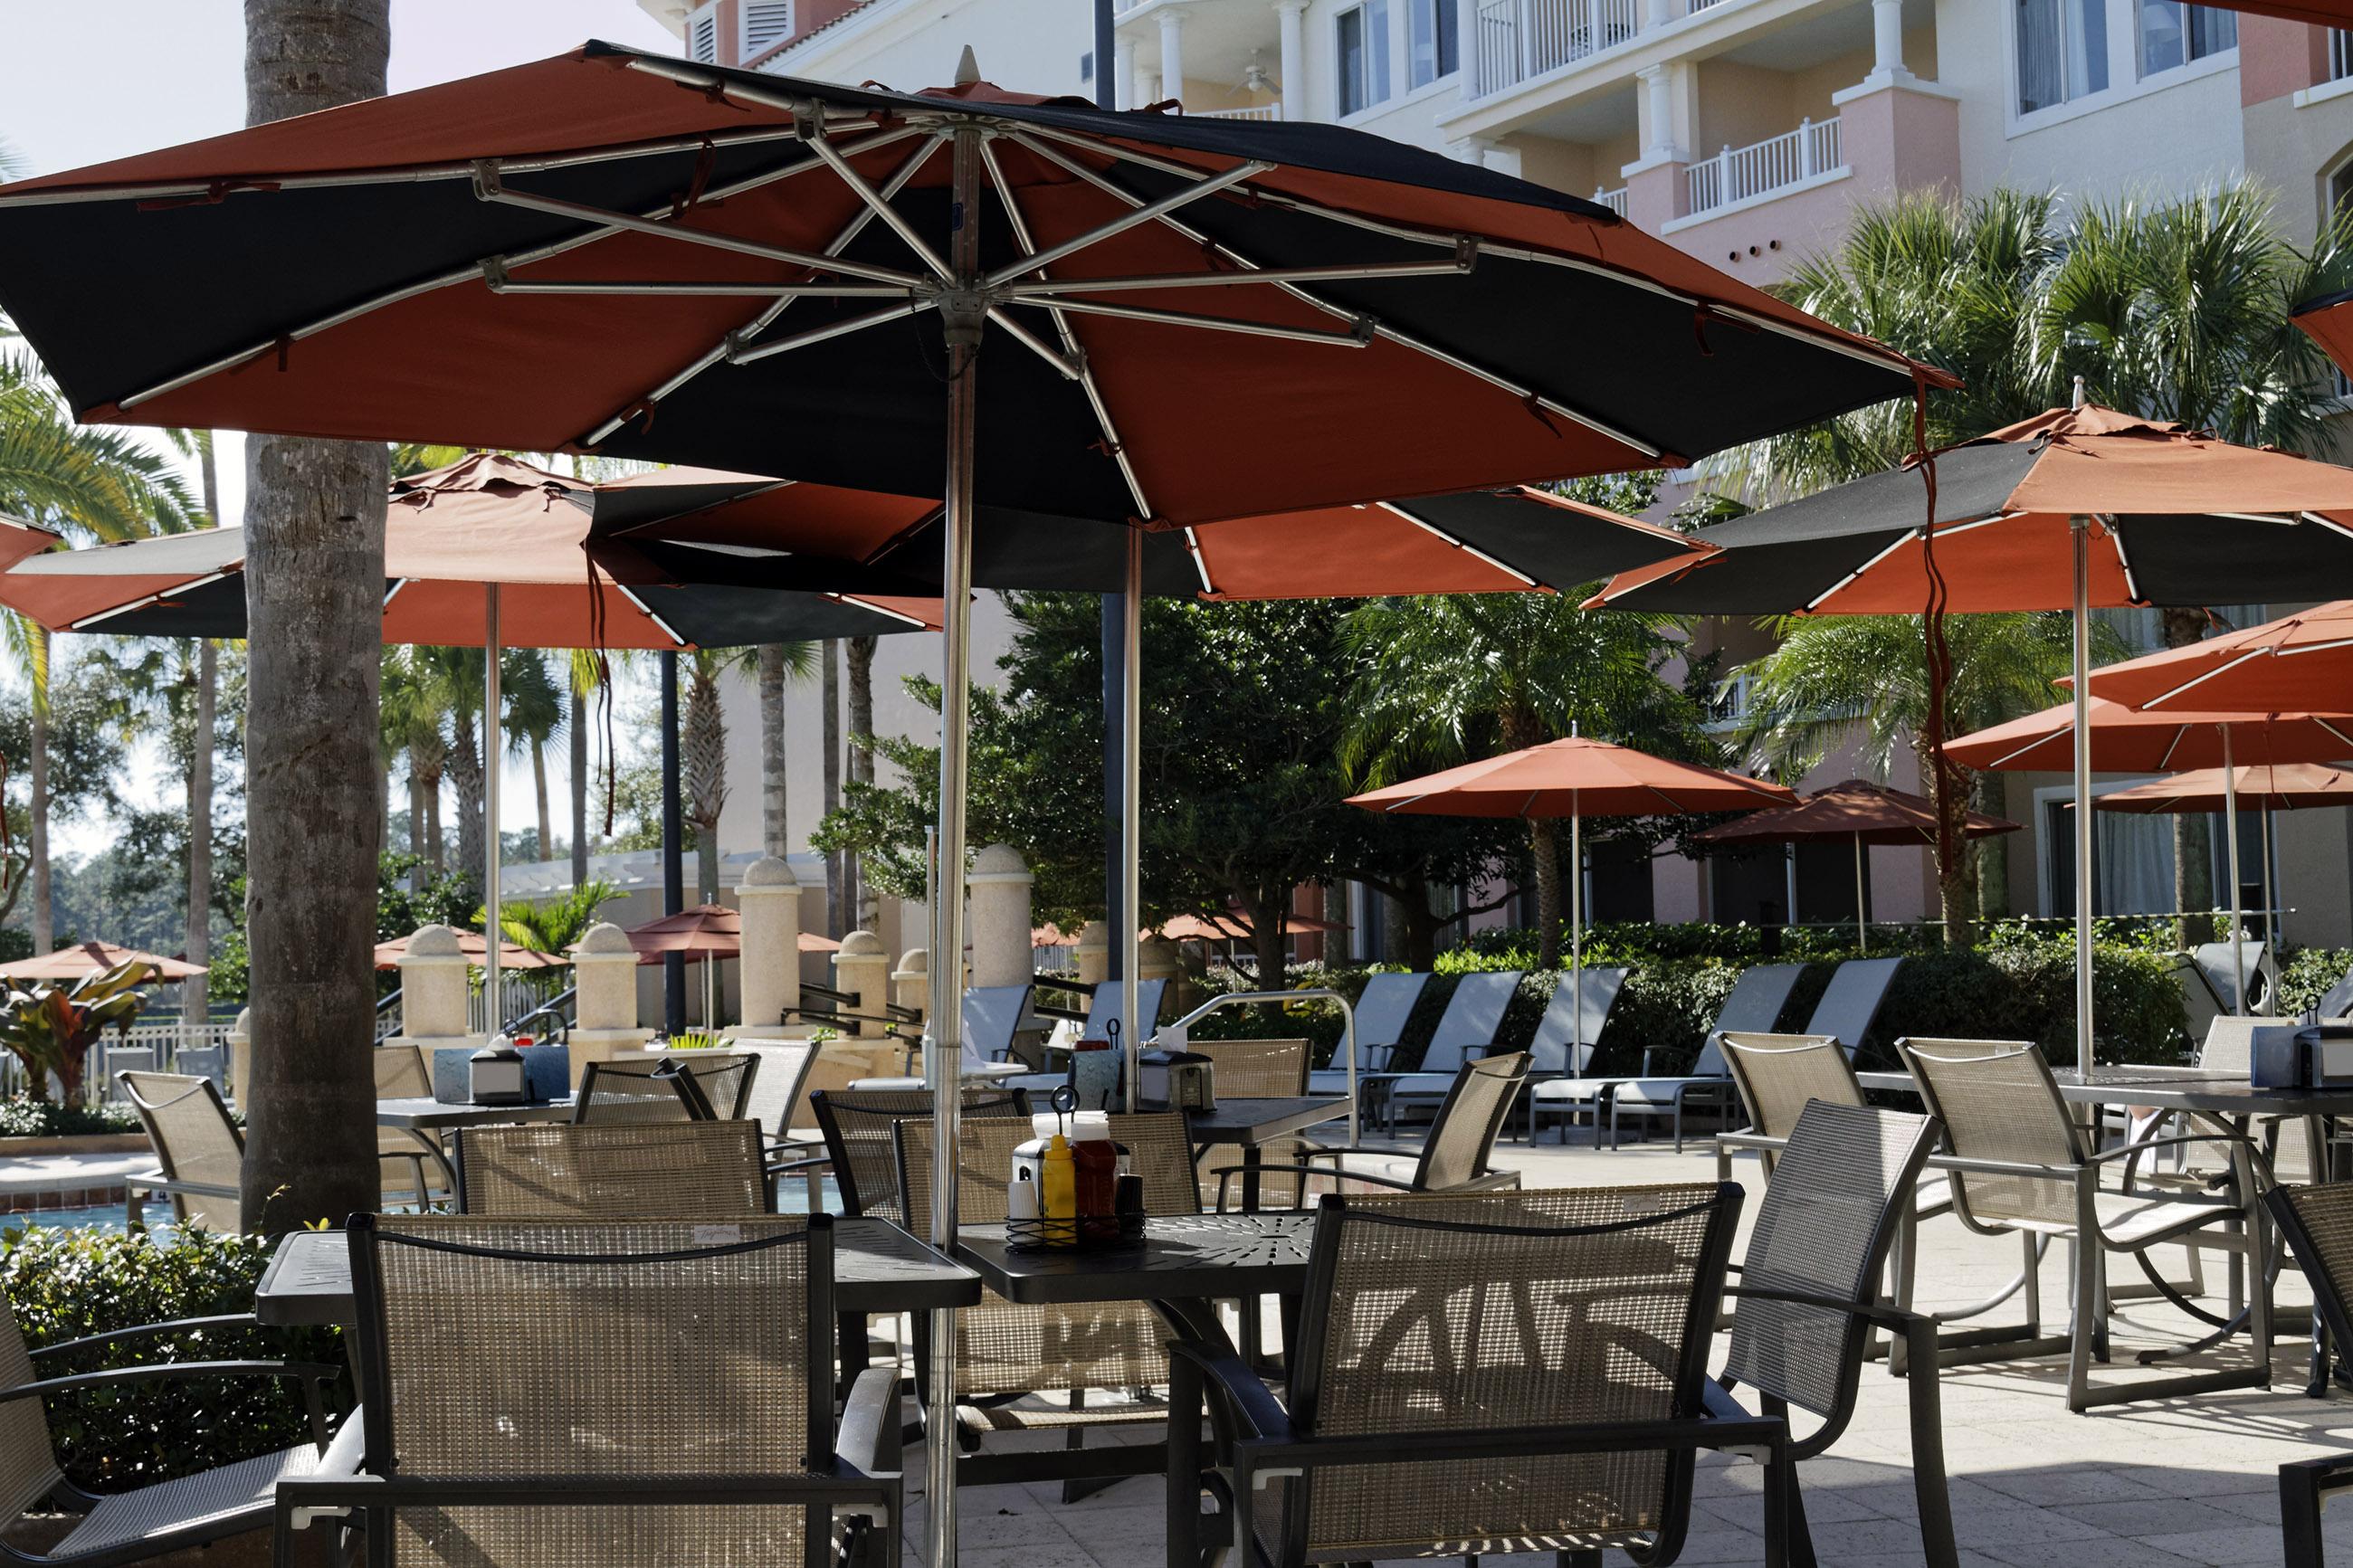 Resort Restaurant, Blue, Sunshine, Resort, Restaurant, HQ Photo